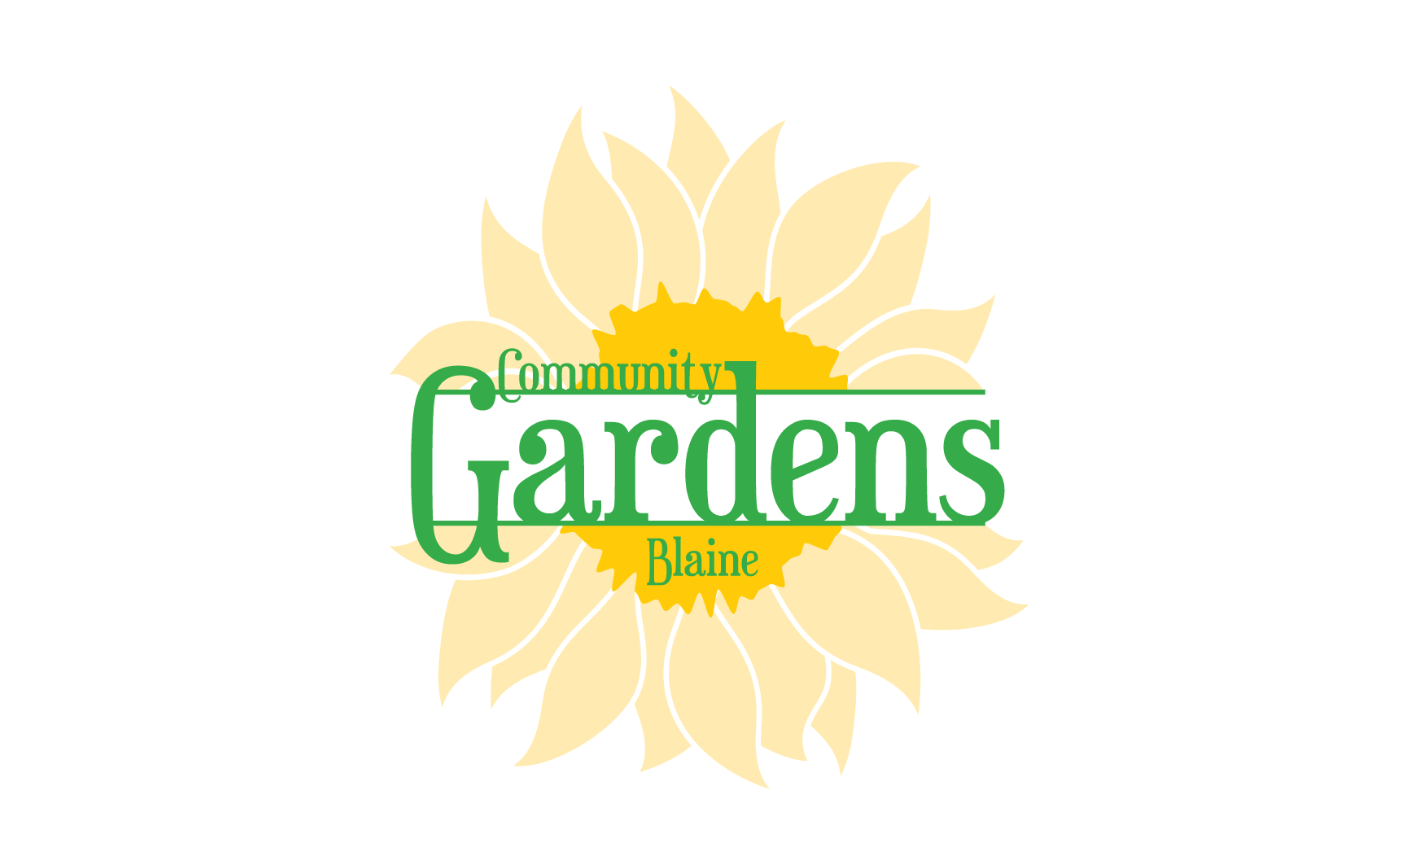 Blaine Community Gardens